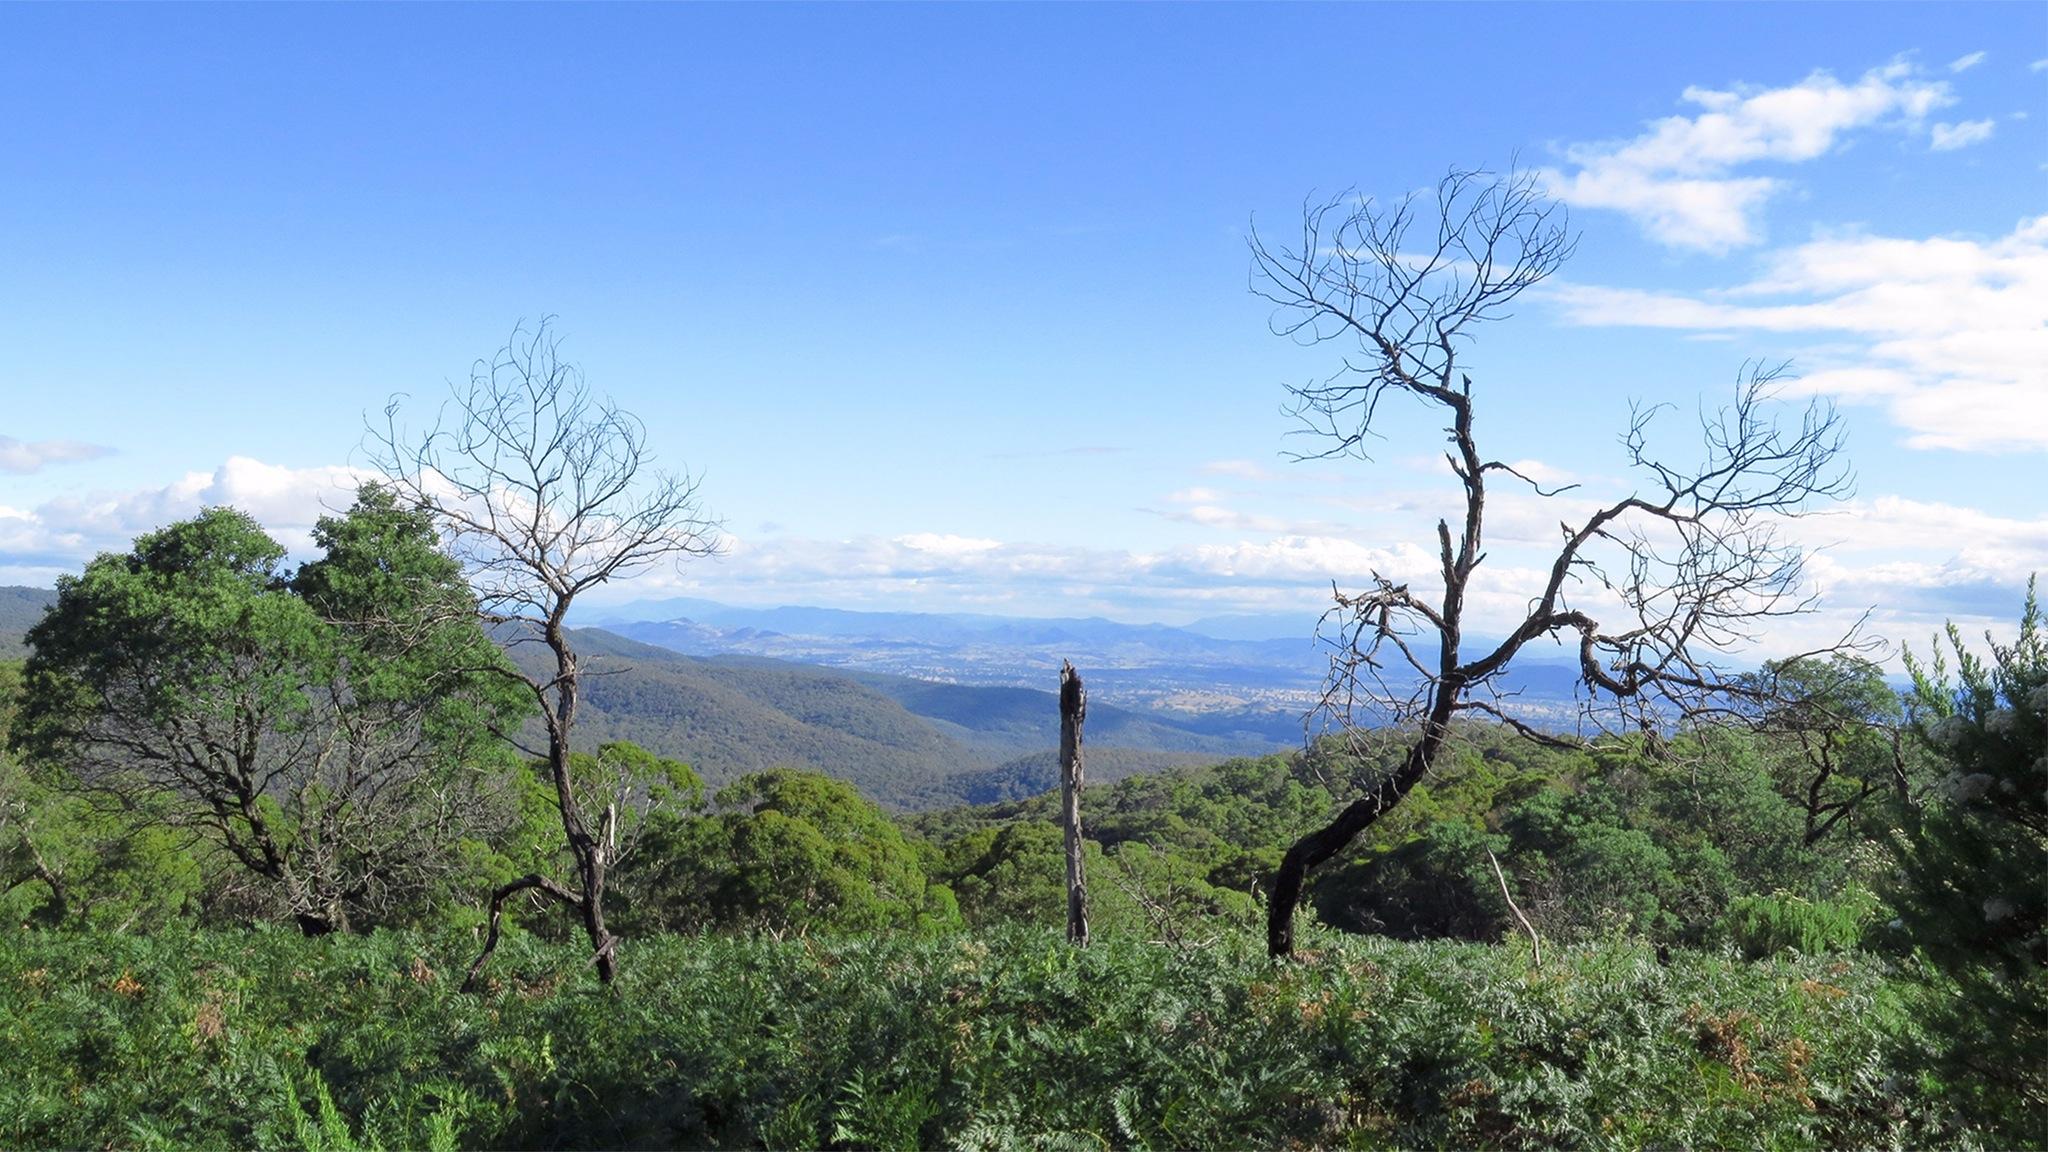 Mount Samaria State Park